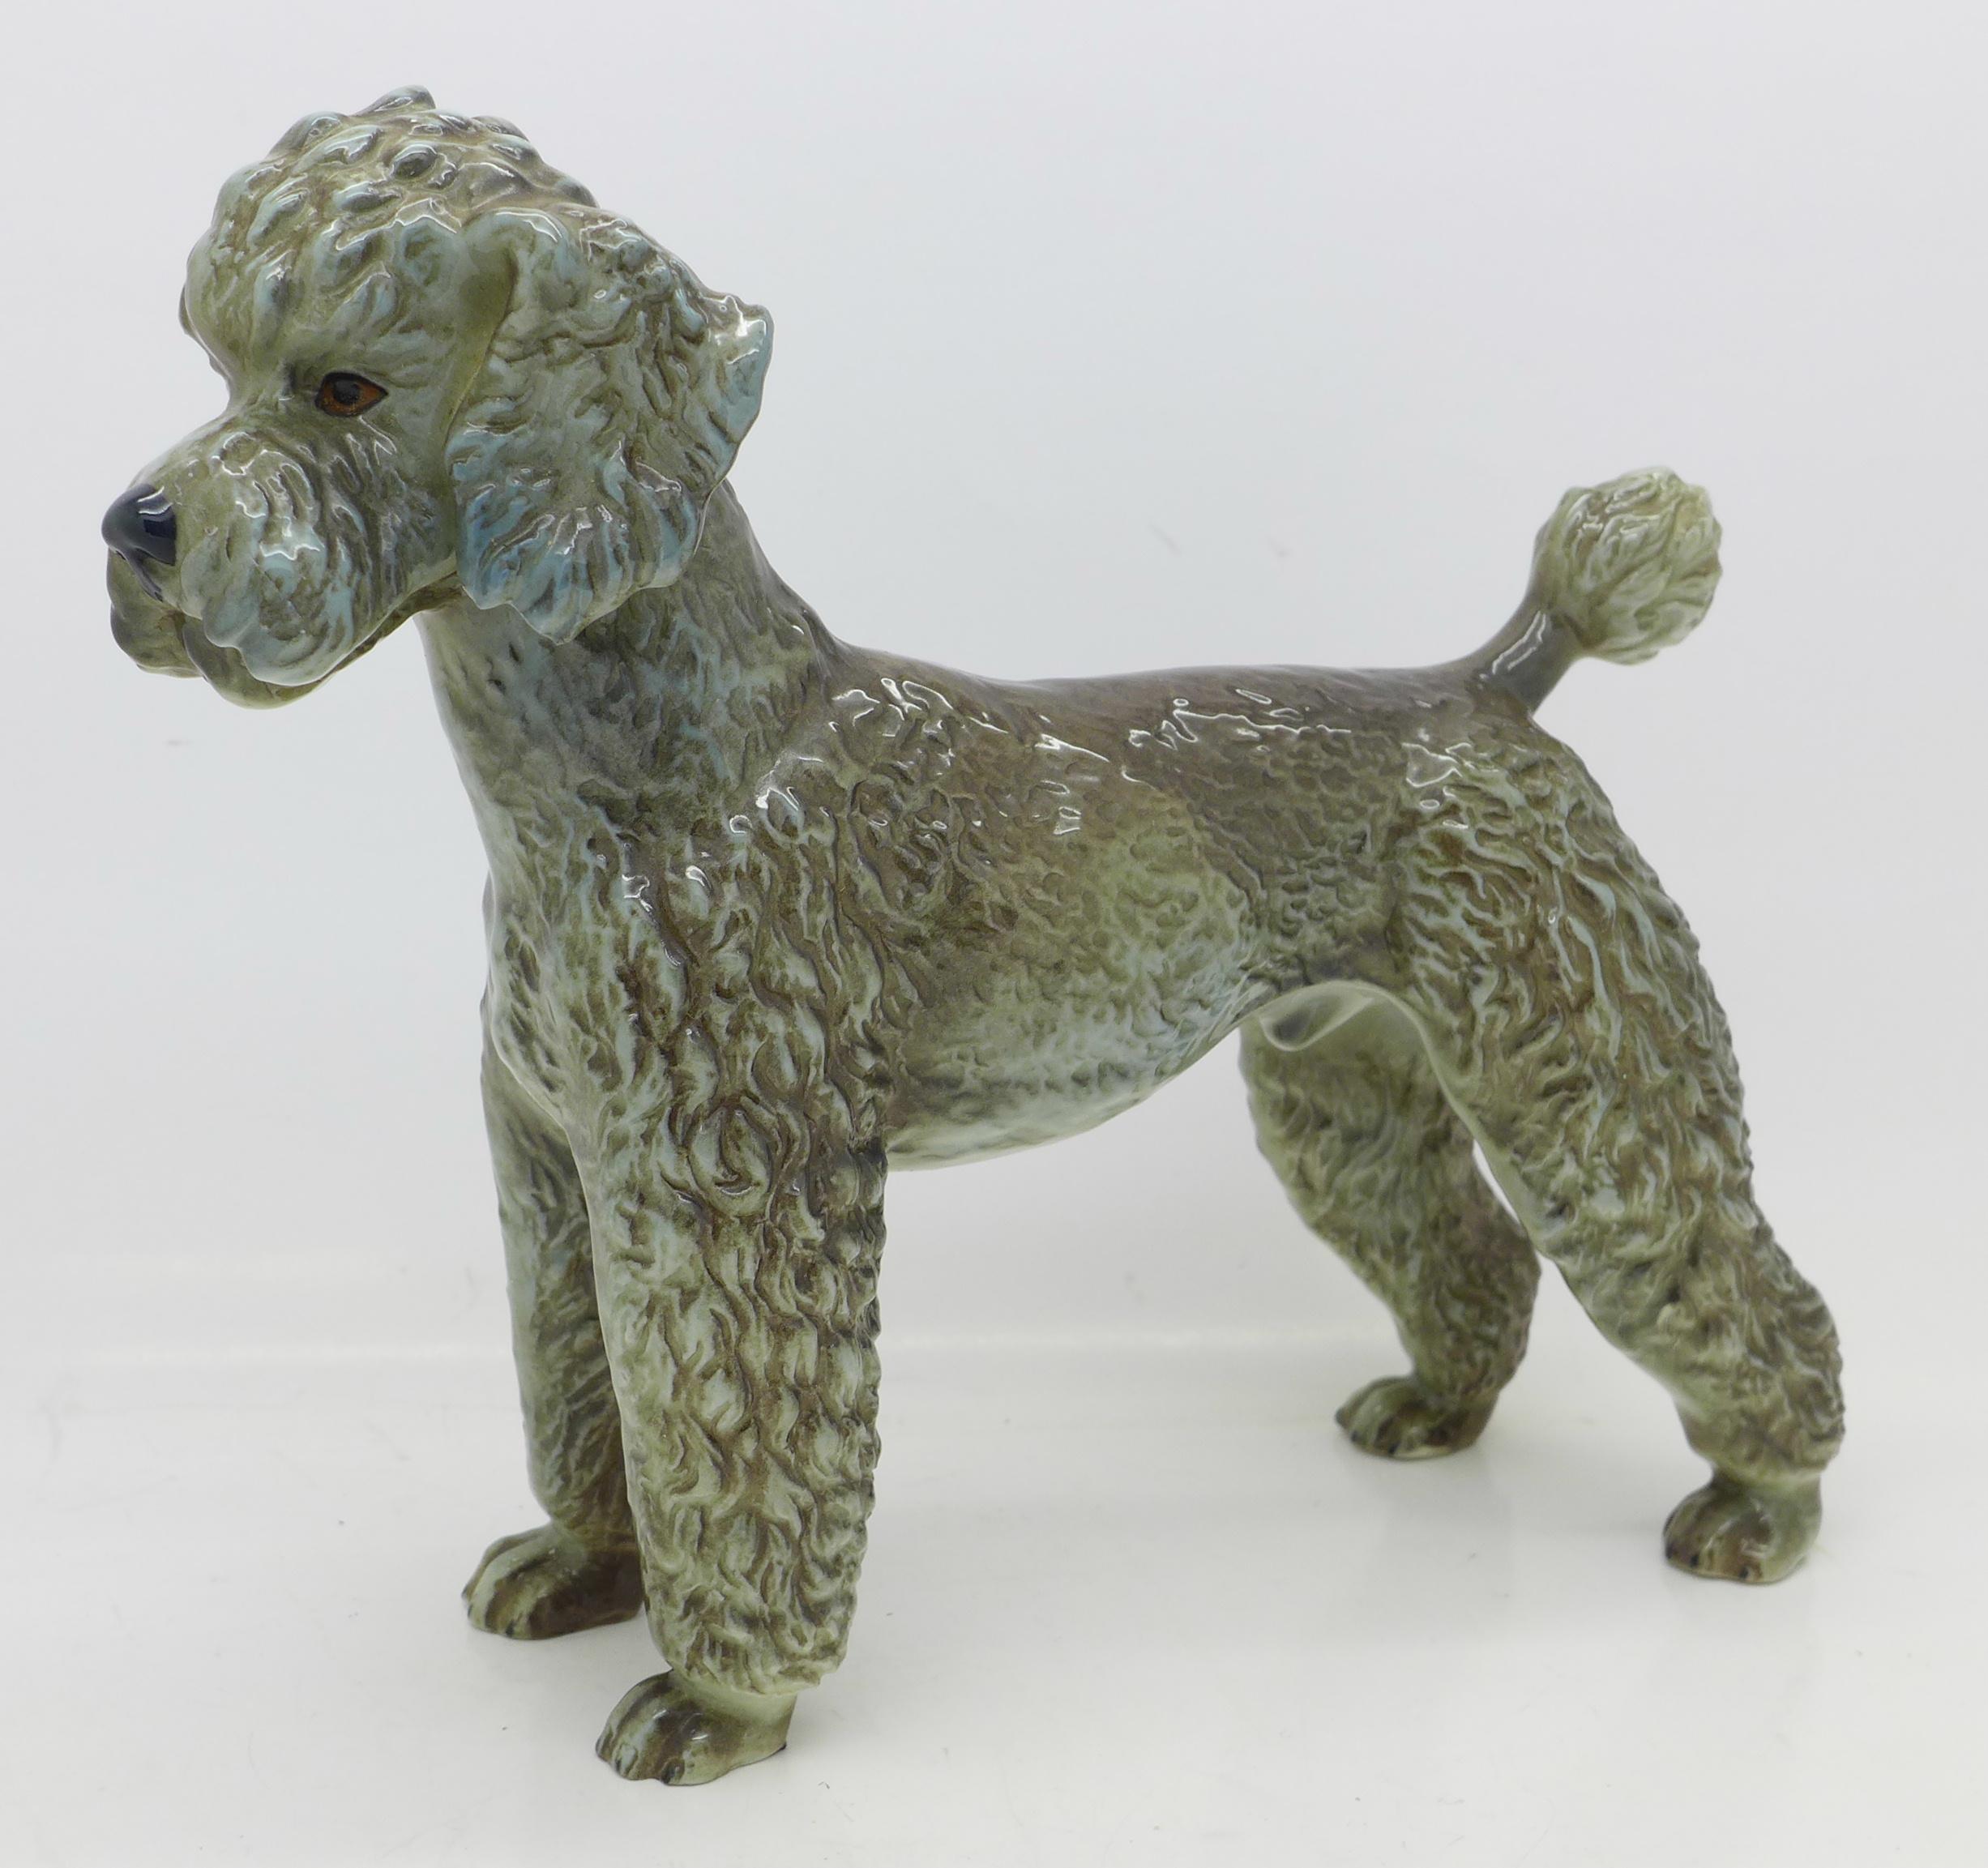 Lot 631 - A Goebel figure of a poodle,